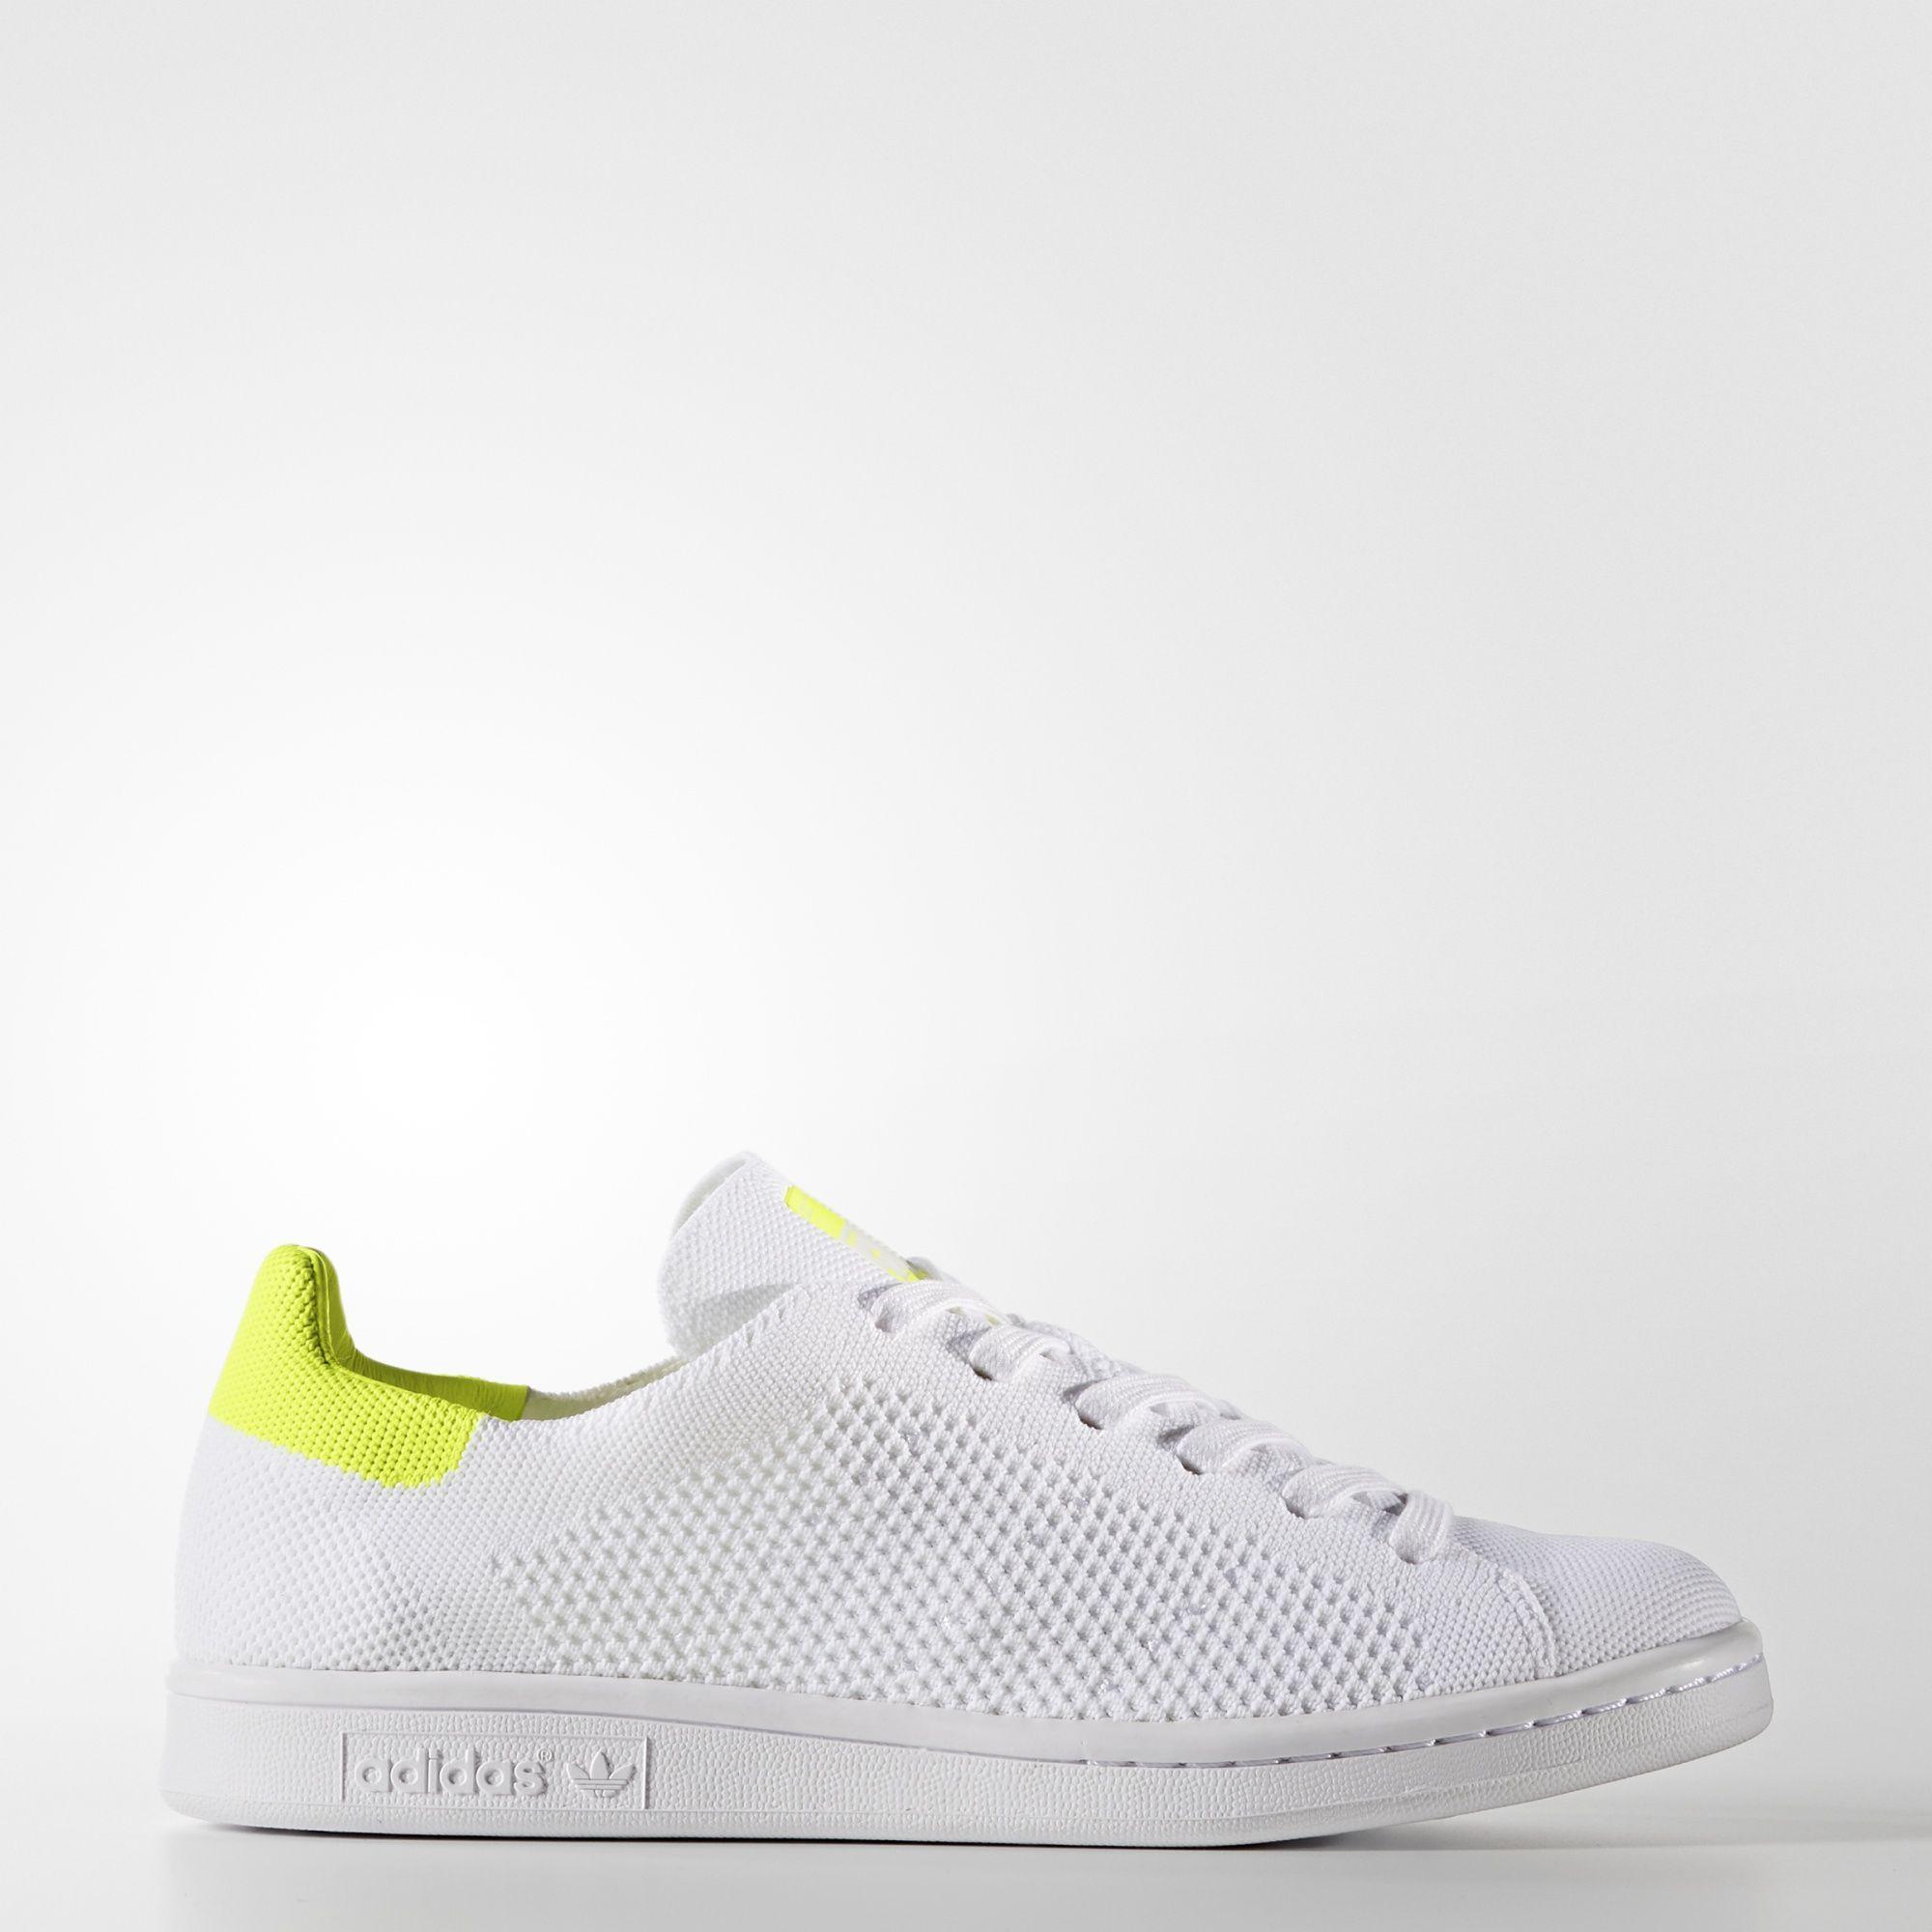 Adidas Stan Primeknit Smith ShoesОбувь ГКроссовки В 2019 Klc1FJ